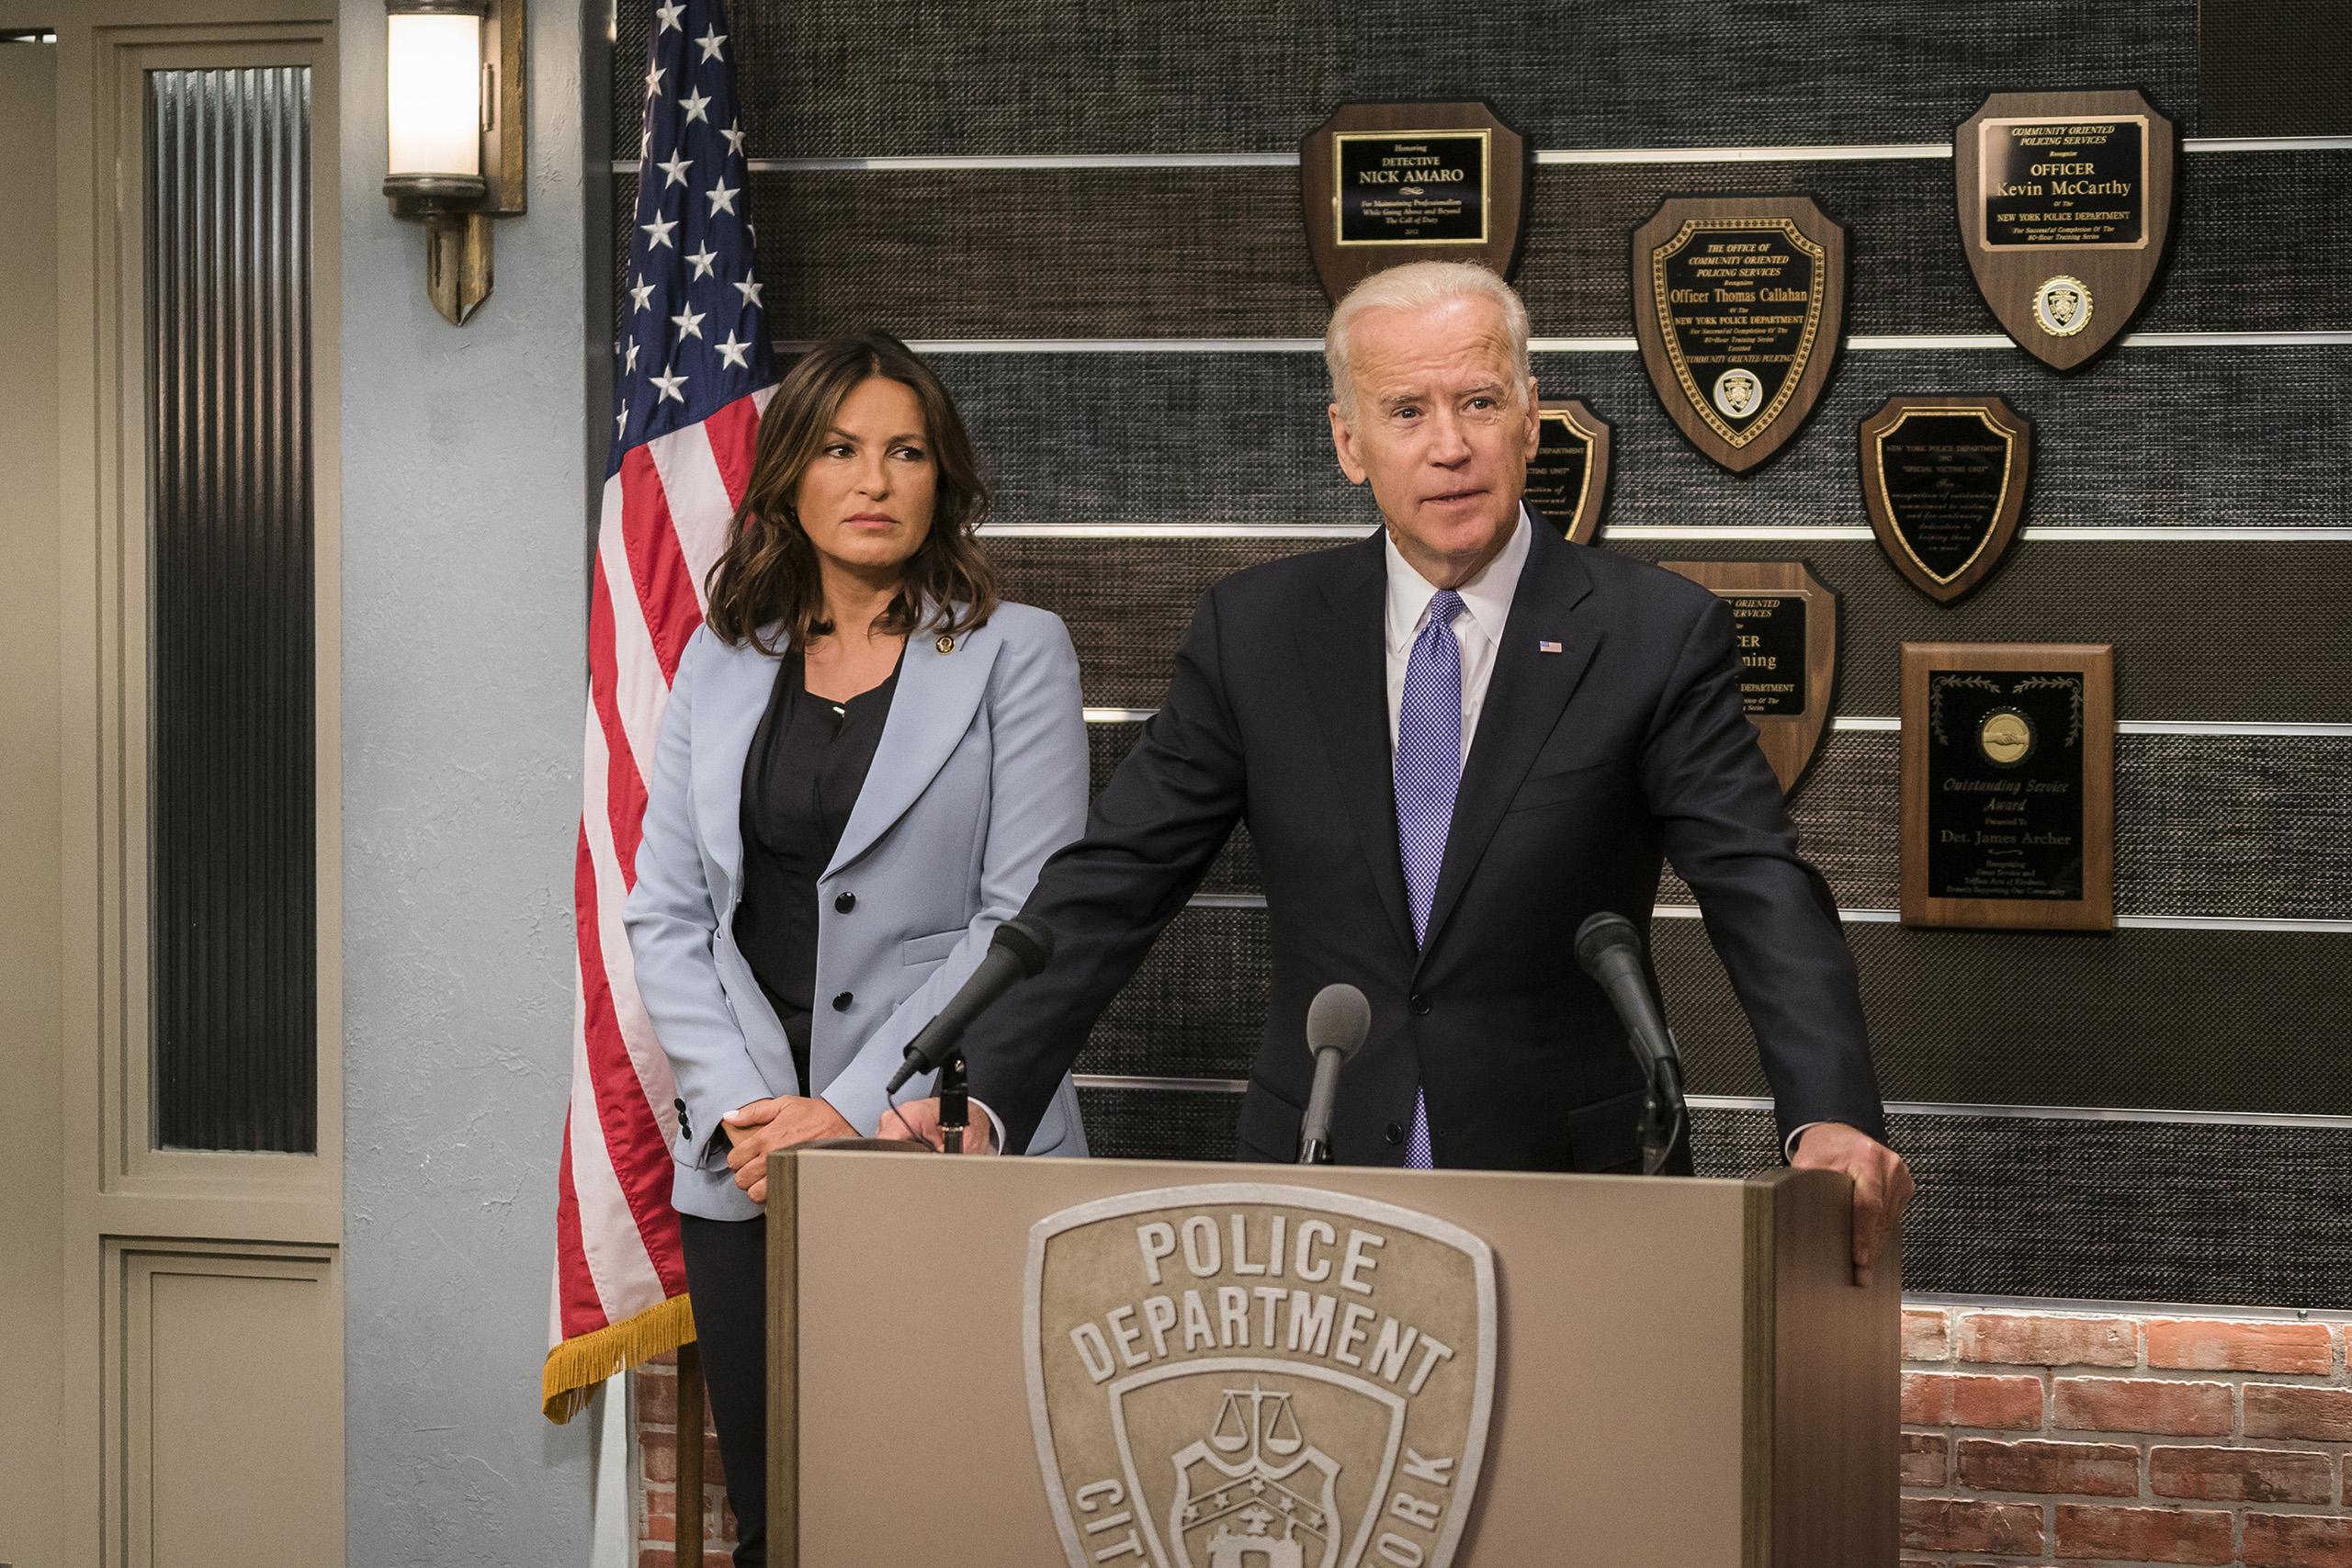 Vice President Joe Biden and Mariska Hargitay as Lieutenant Olivia Benson in Law & Order: Special Victims Unit, Episode 1802.